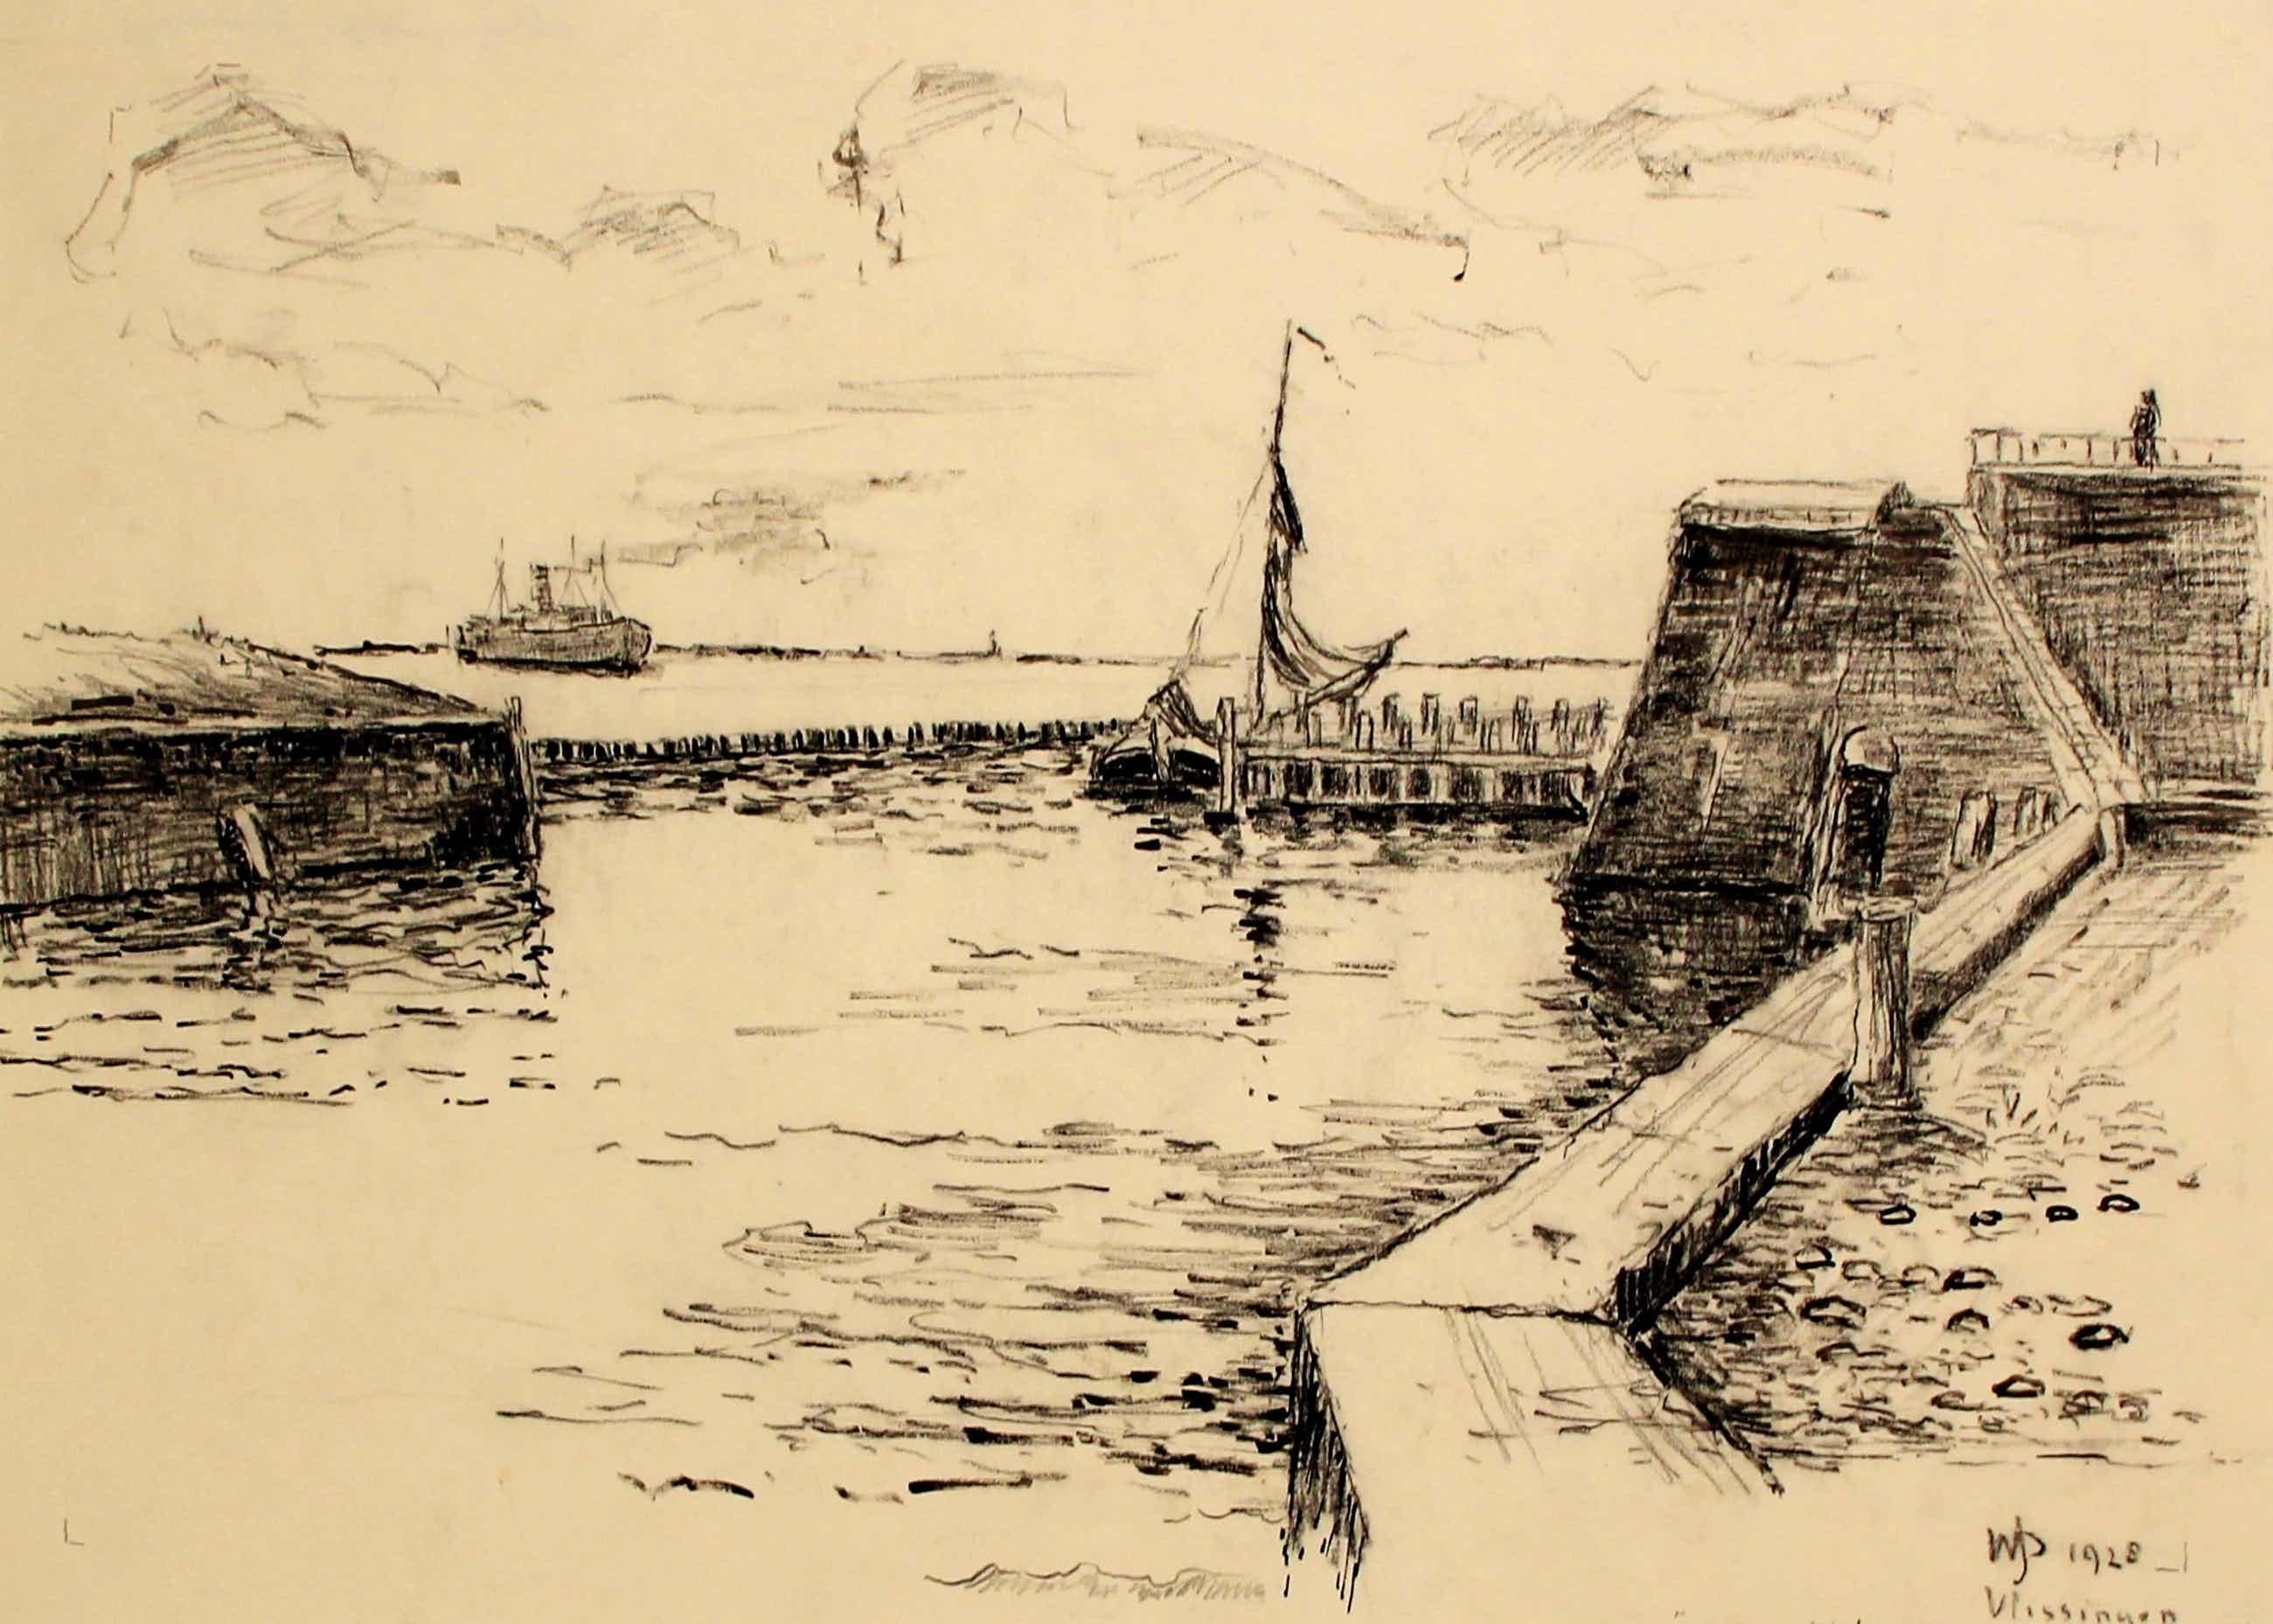 Willem Jans Dijk - tekening: Vlissingen ingang vissershaven - 1928 kopen? Bied vanaf 105!